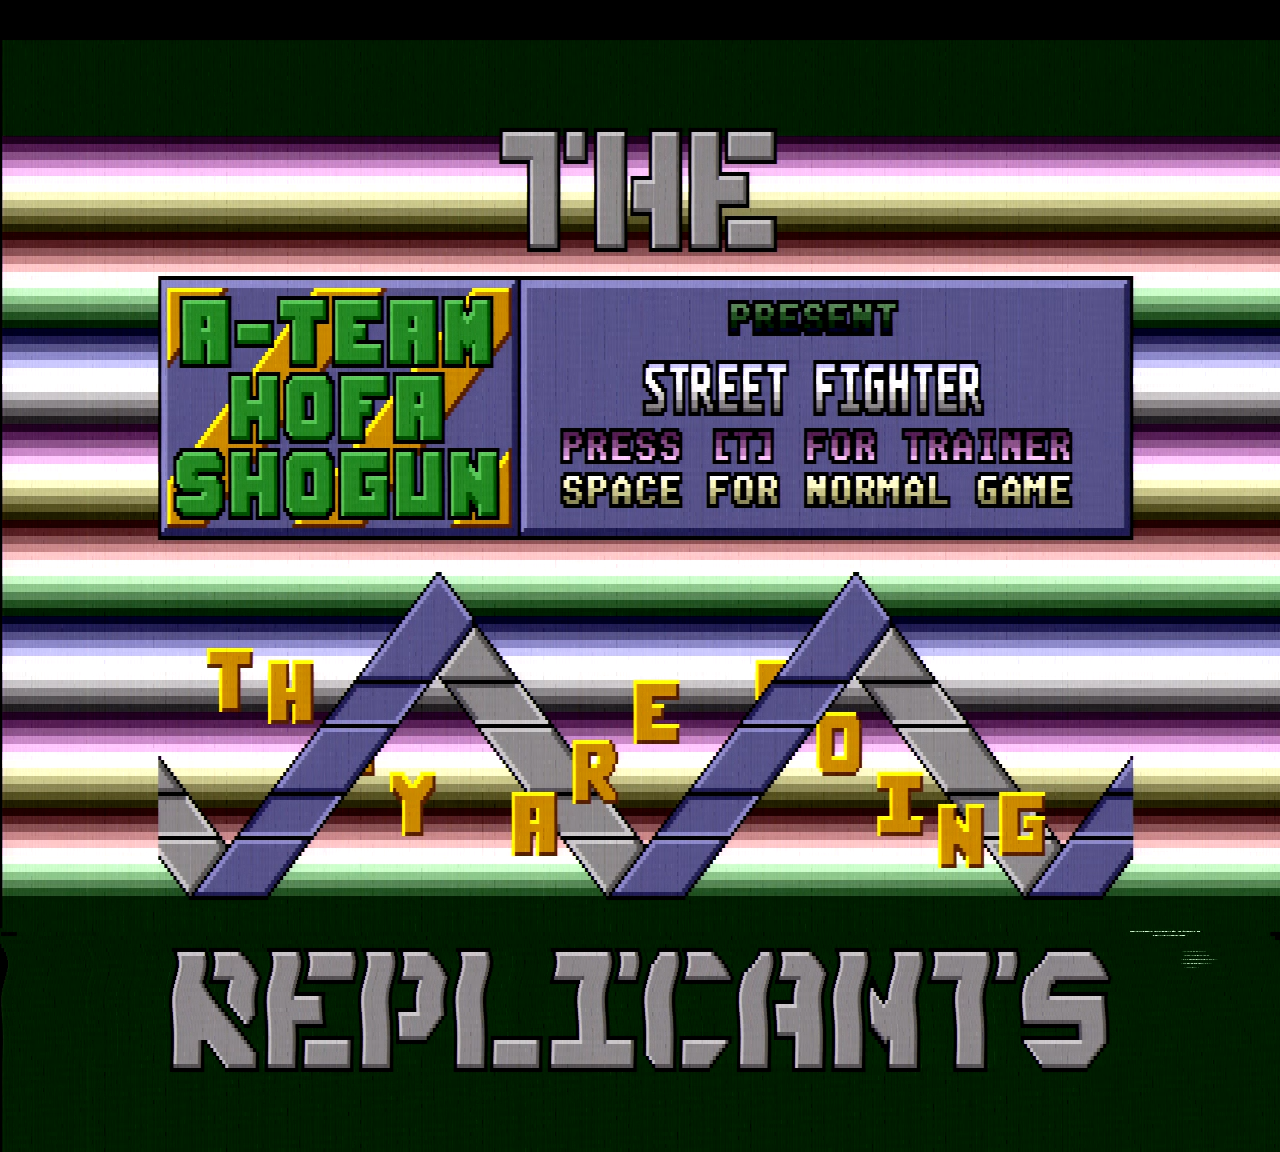 More replicants